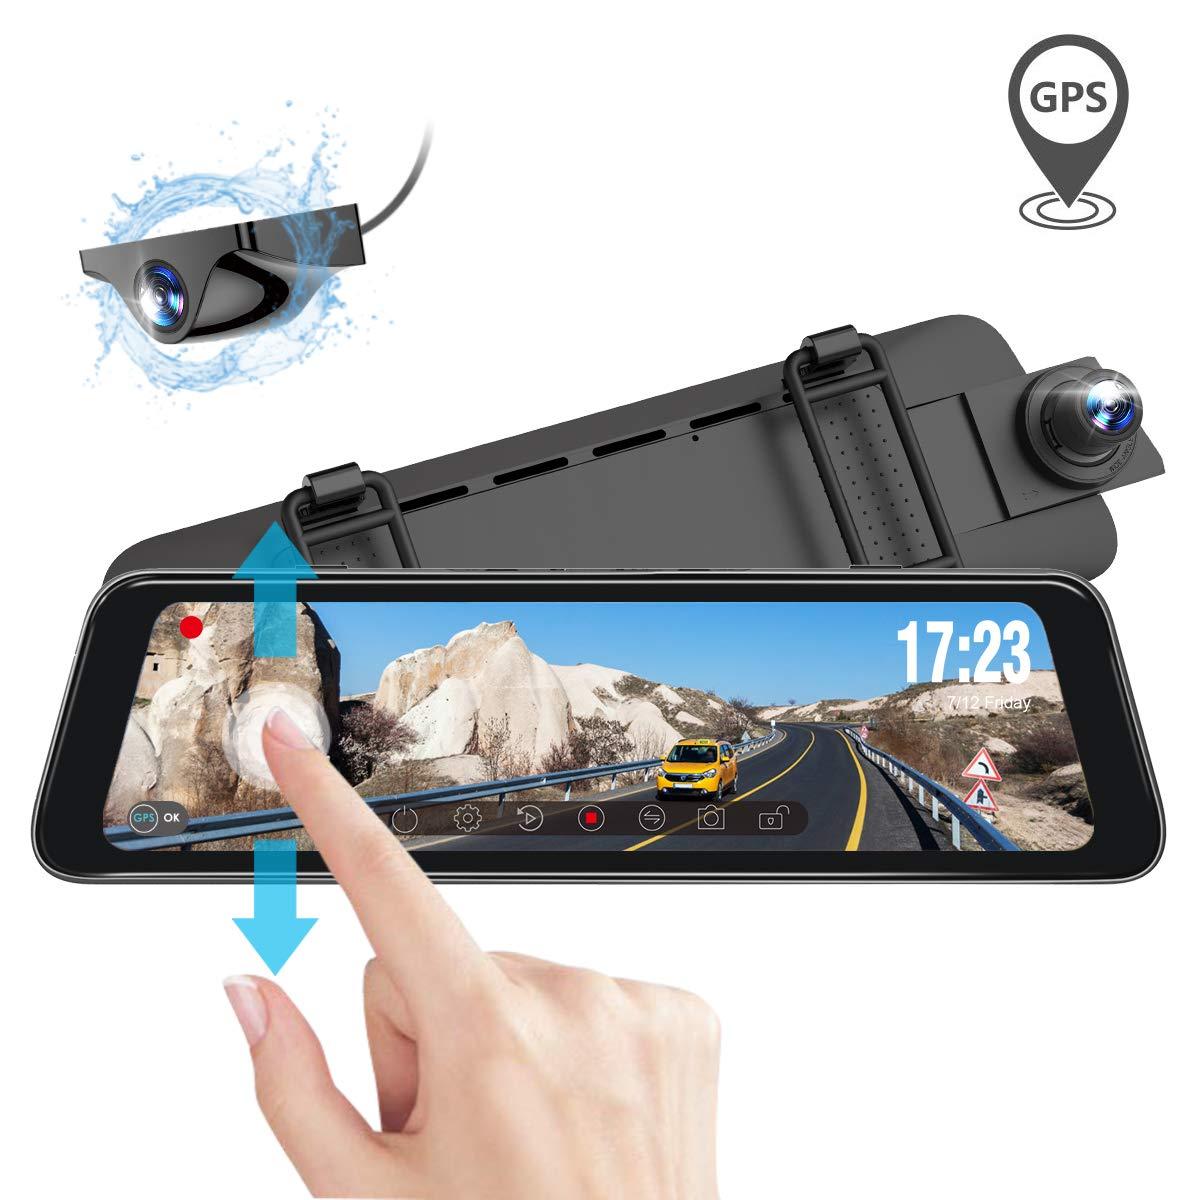 Vantrue M1 Rearview Mirror Dash Cam GPS Waterproof Backup Camera 9.88'' Dual 1080P Front and Rear Dash Cam, 2K 1296P Touch Screen Front Dash Camera, Night Vision, 24 Hours Parking Mode, Motion Sensor by VANTRUE